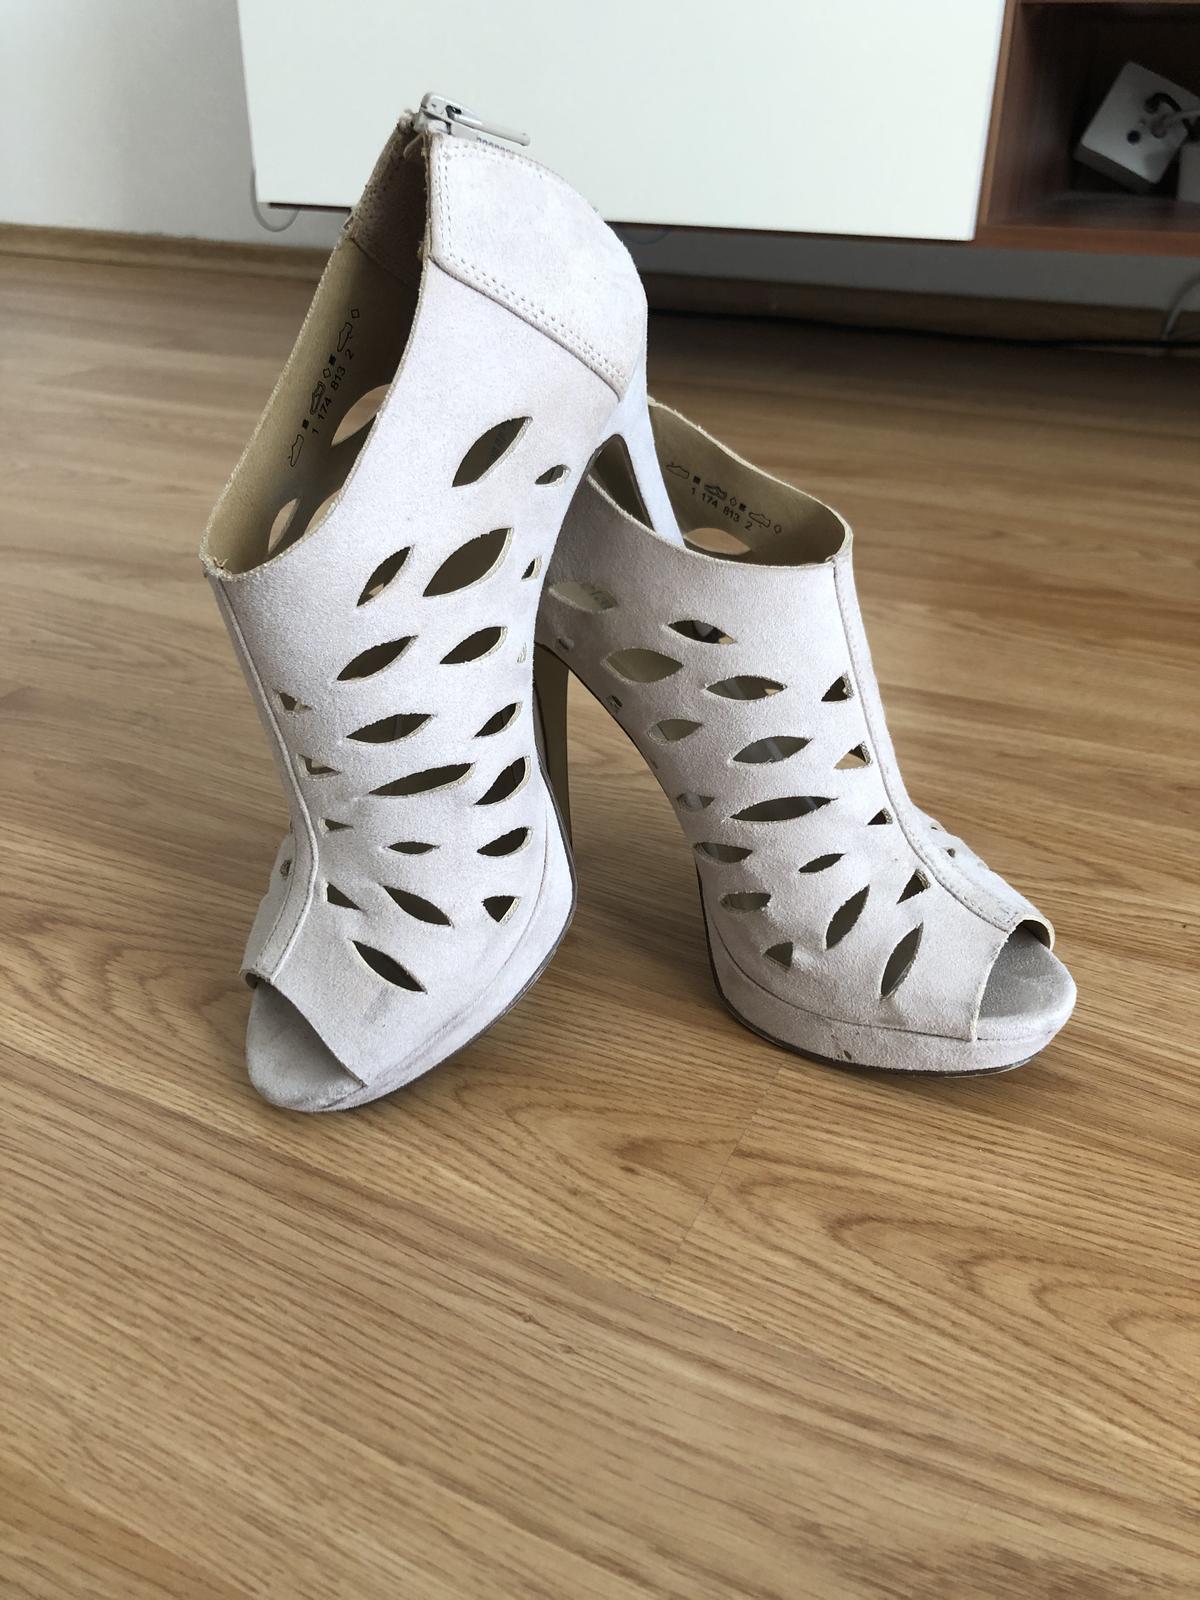 Smotanove sandalky - Obrázok č. 2